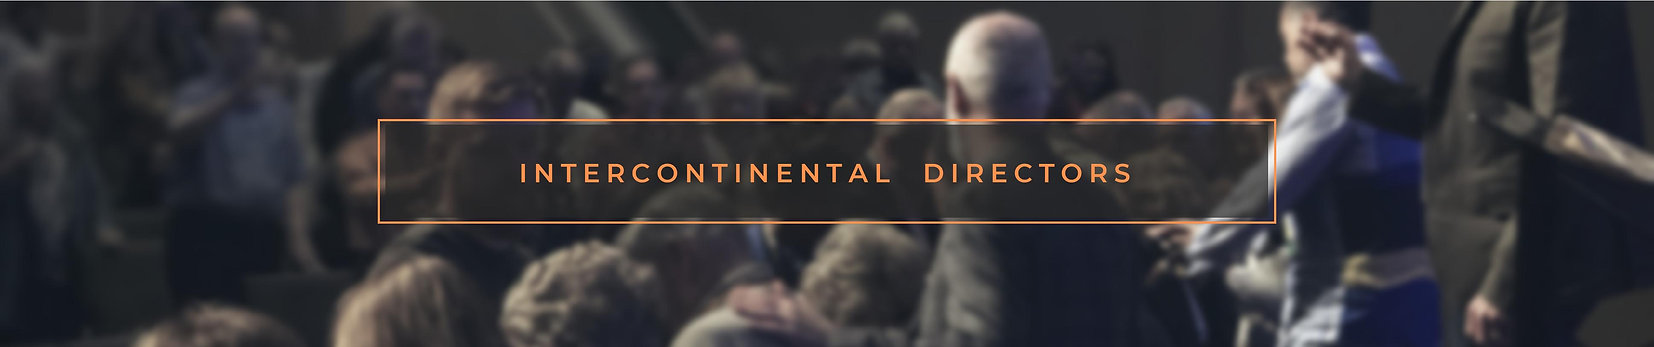 Intercontinental -page-001.jpg